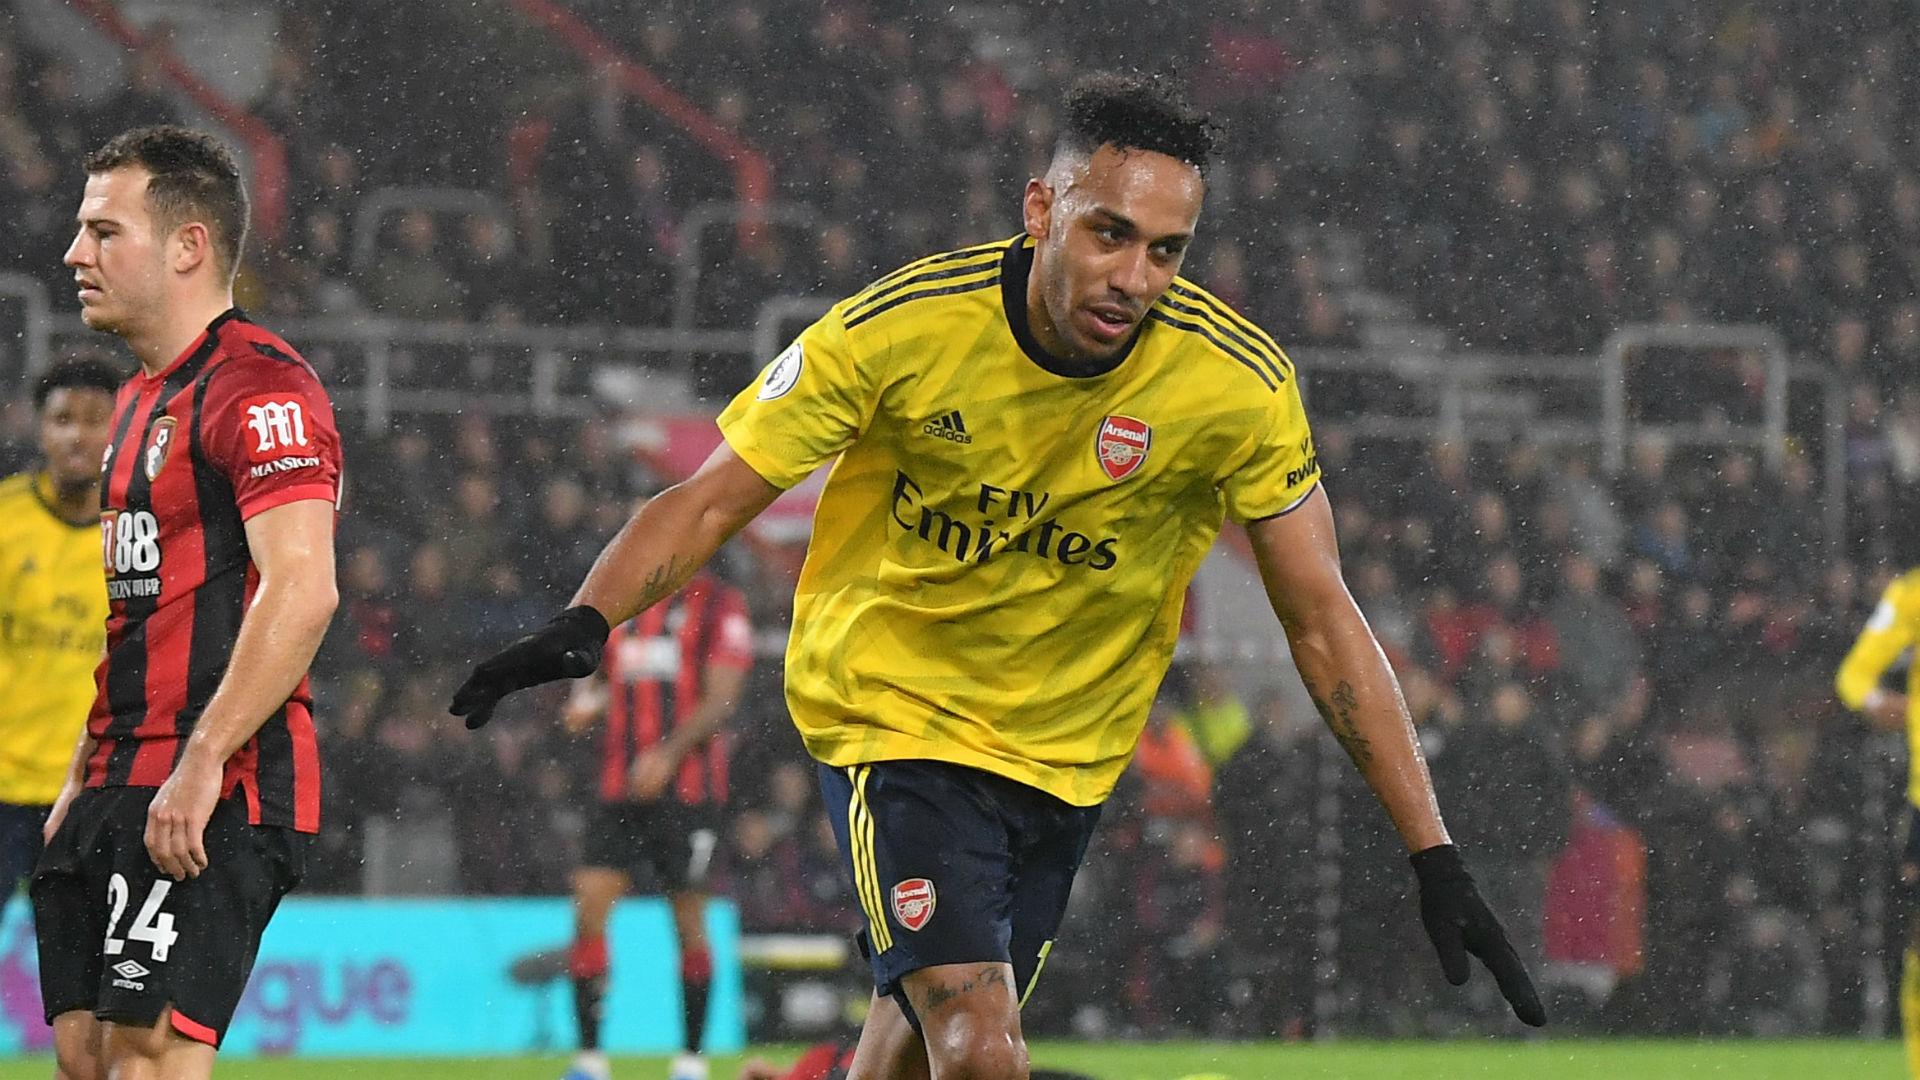 Bournemouth 1-1 Arsenal: Arteta avoids losing start thanks to Aubameyang leveller